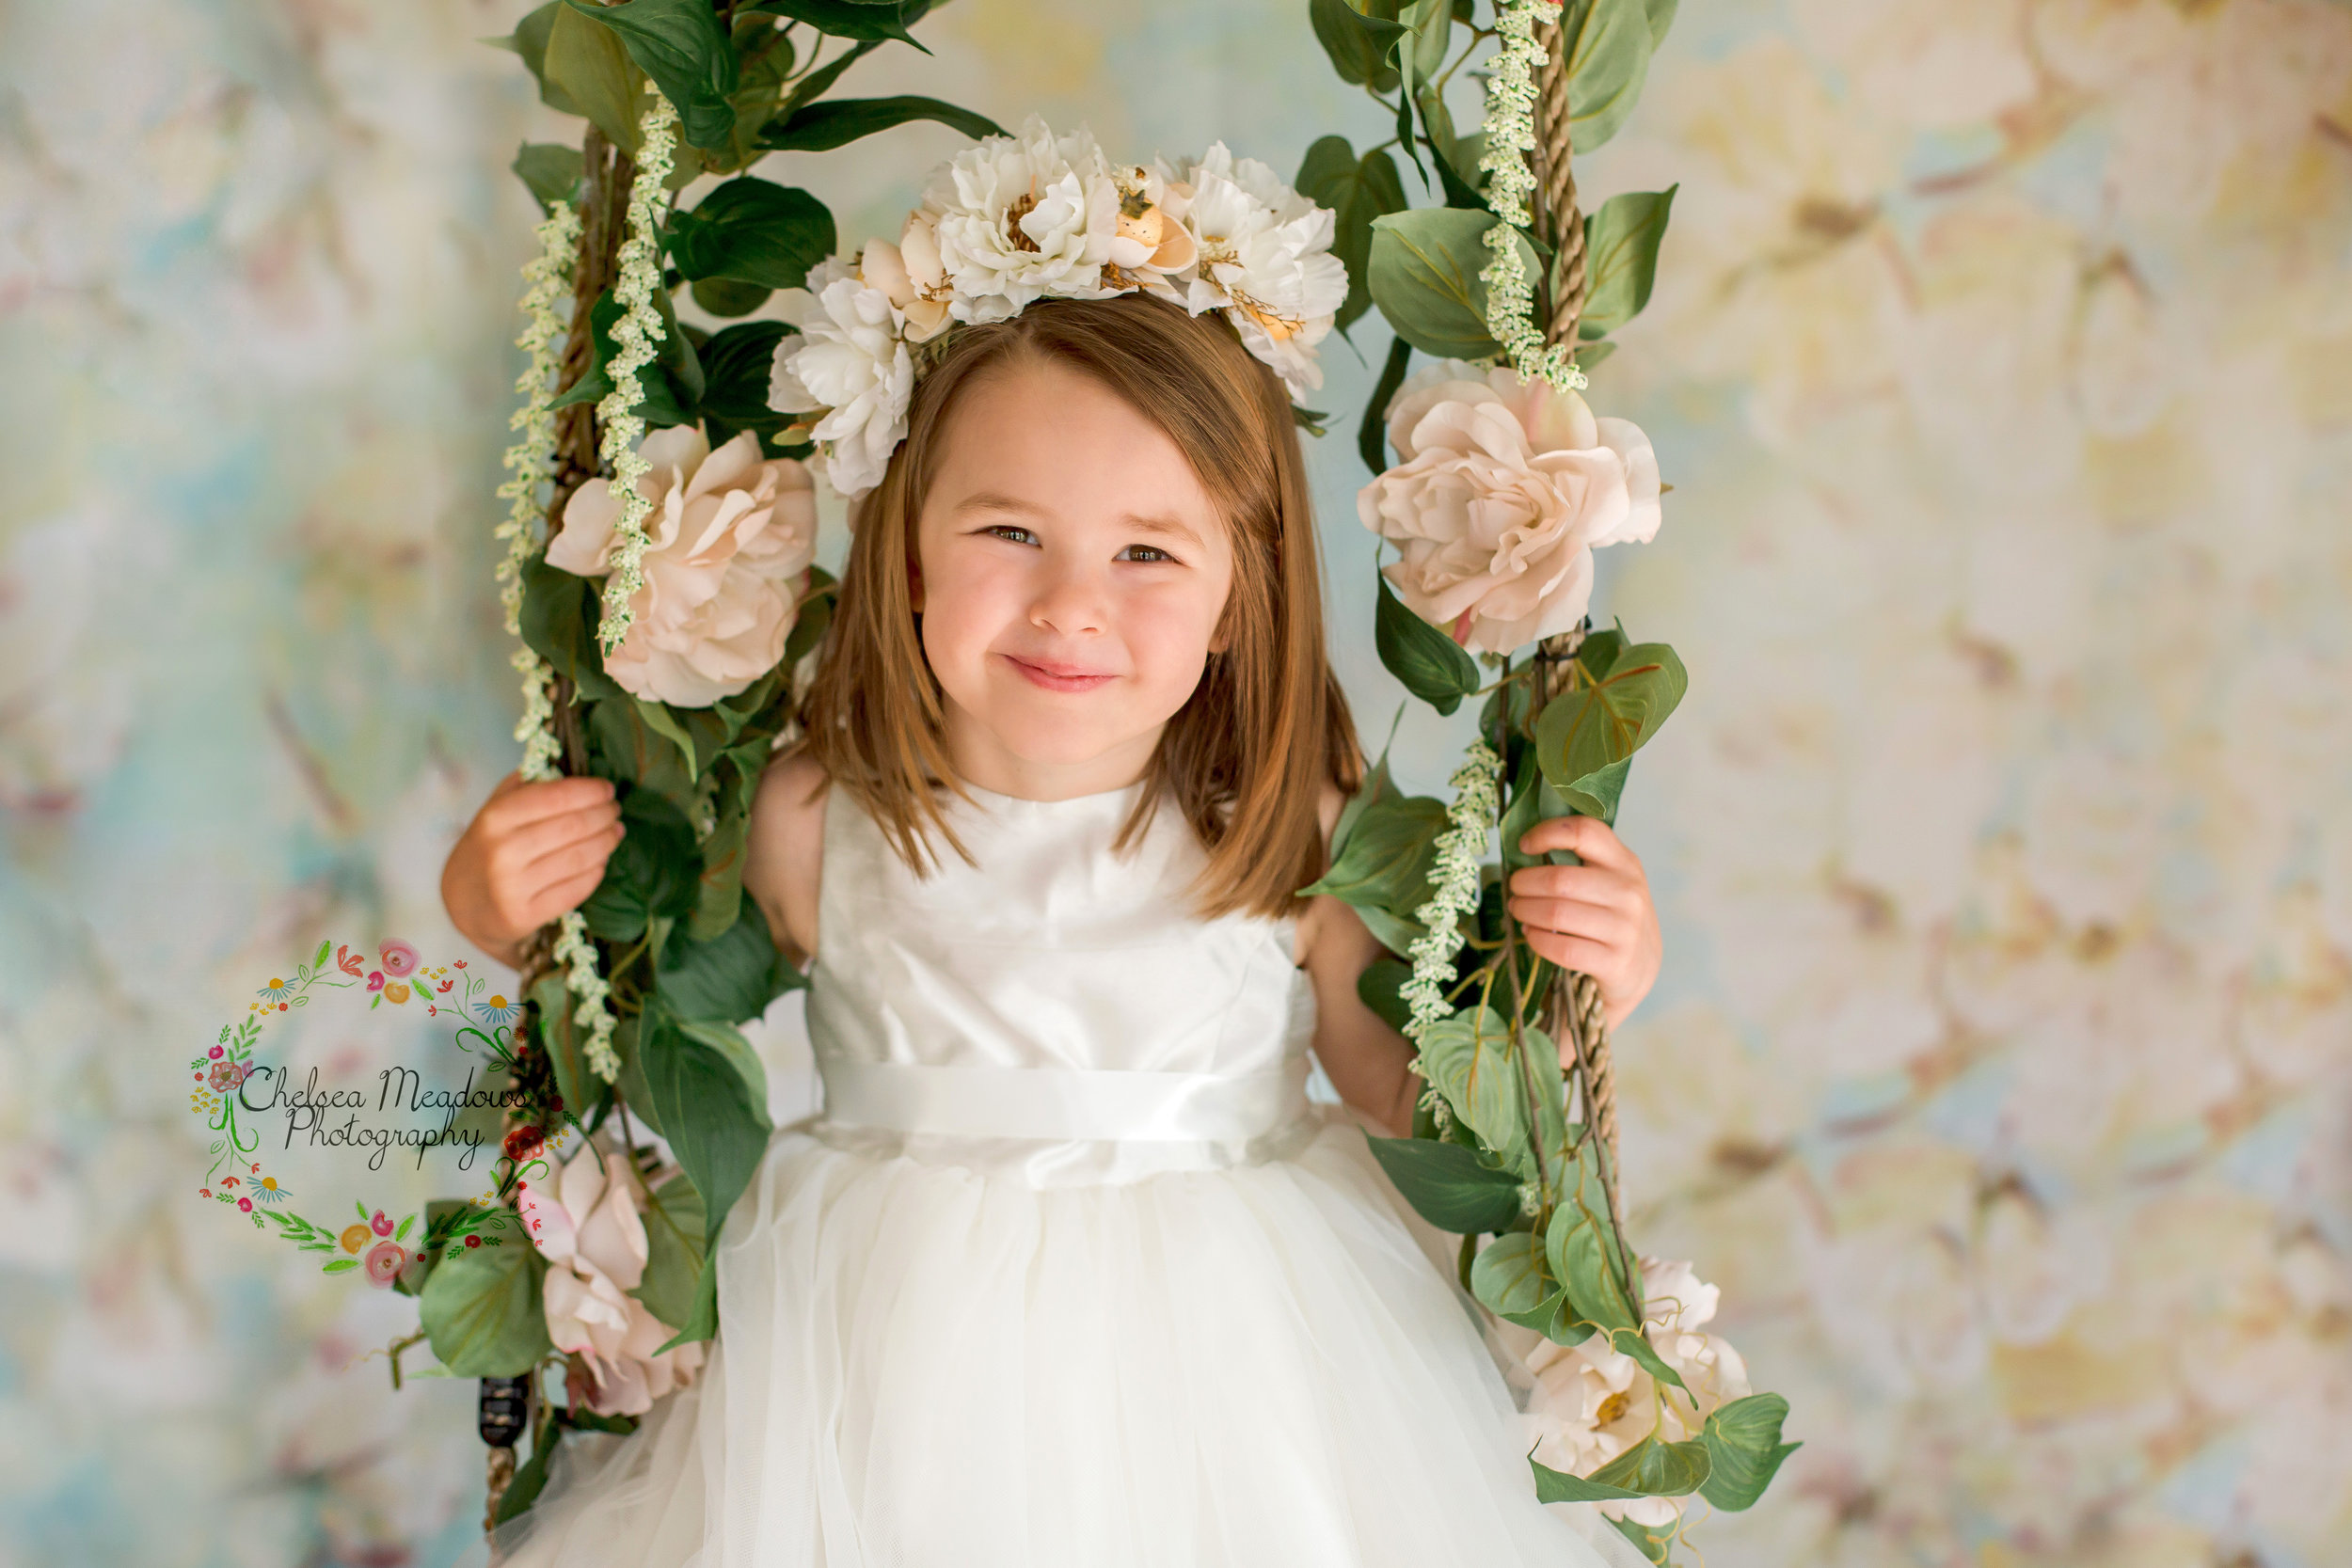 Ellis Family Spring Minis - Nashville Family Photographer - Chelsea Meadows Photography (22)_edited-1.jpg